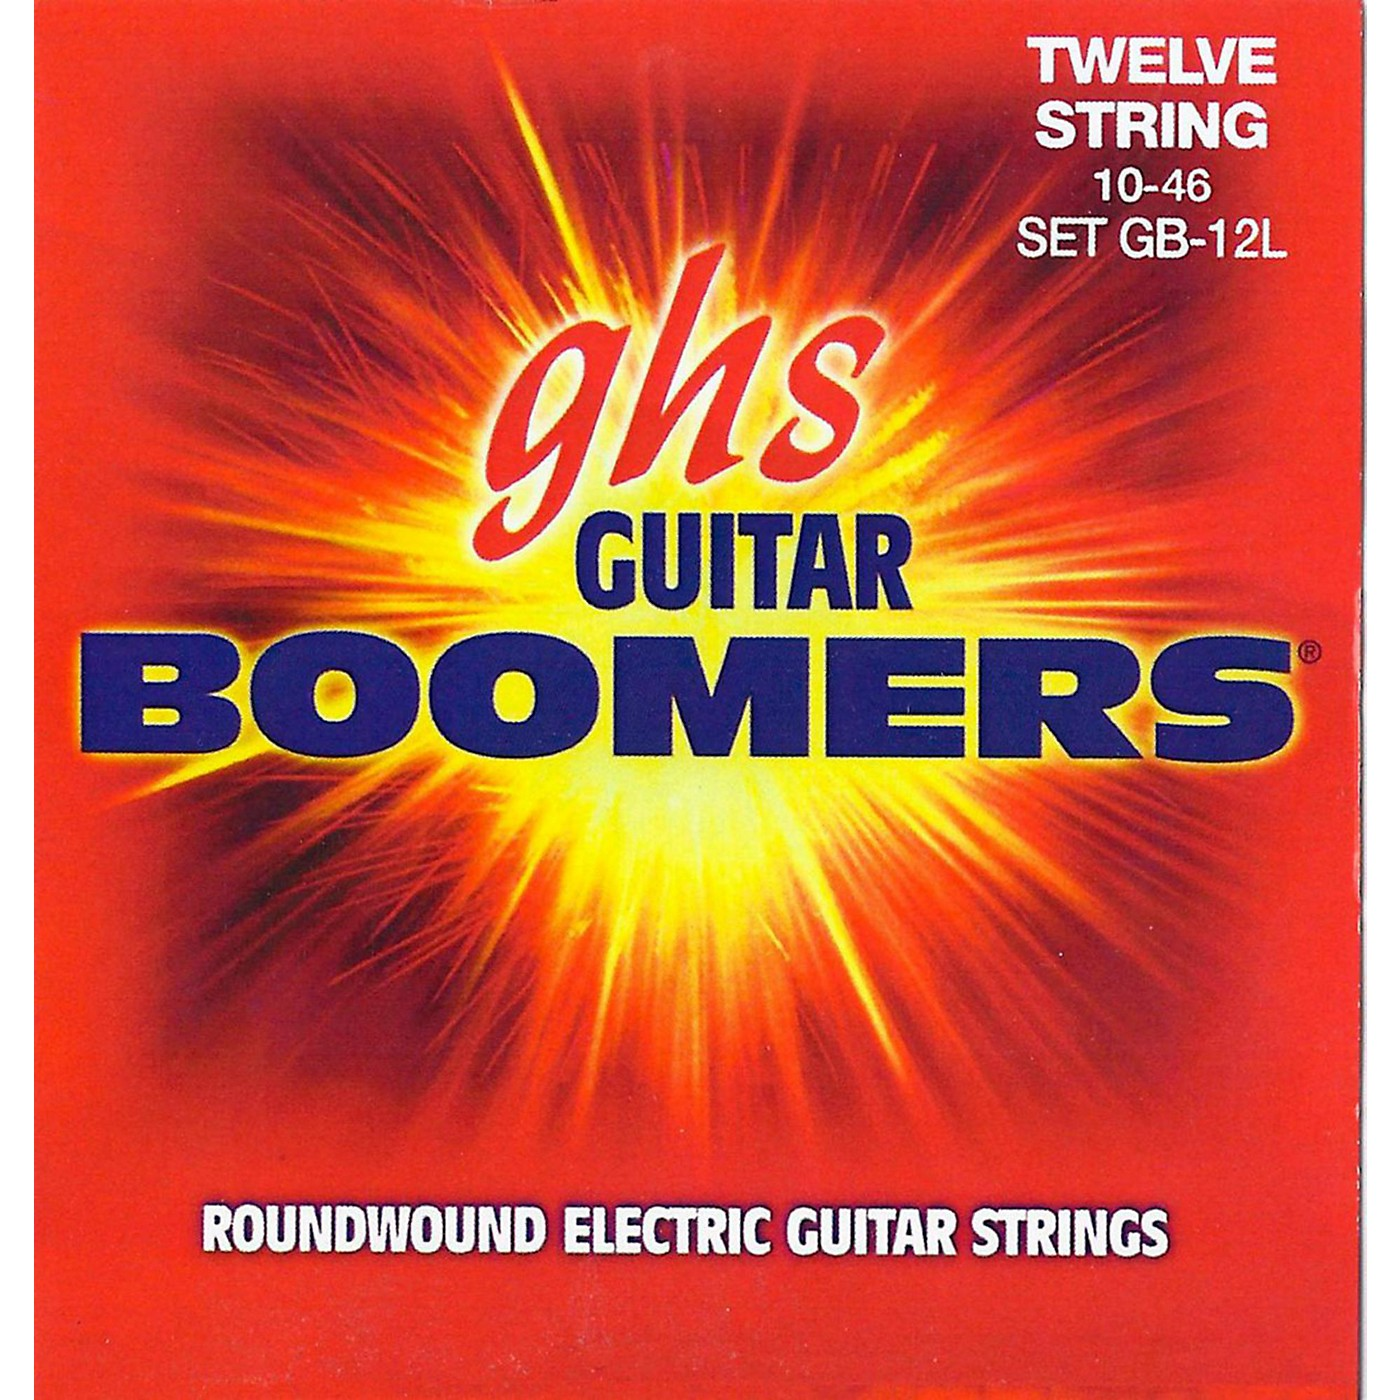 GHS Boomer 12 String Light Electric Guitar Set (10-46) thumbnail